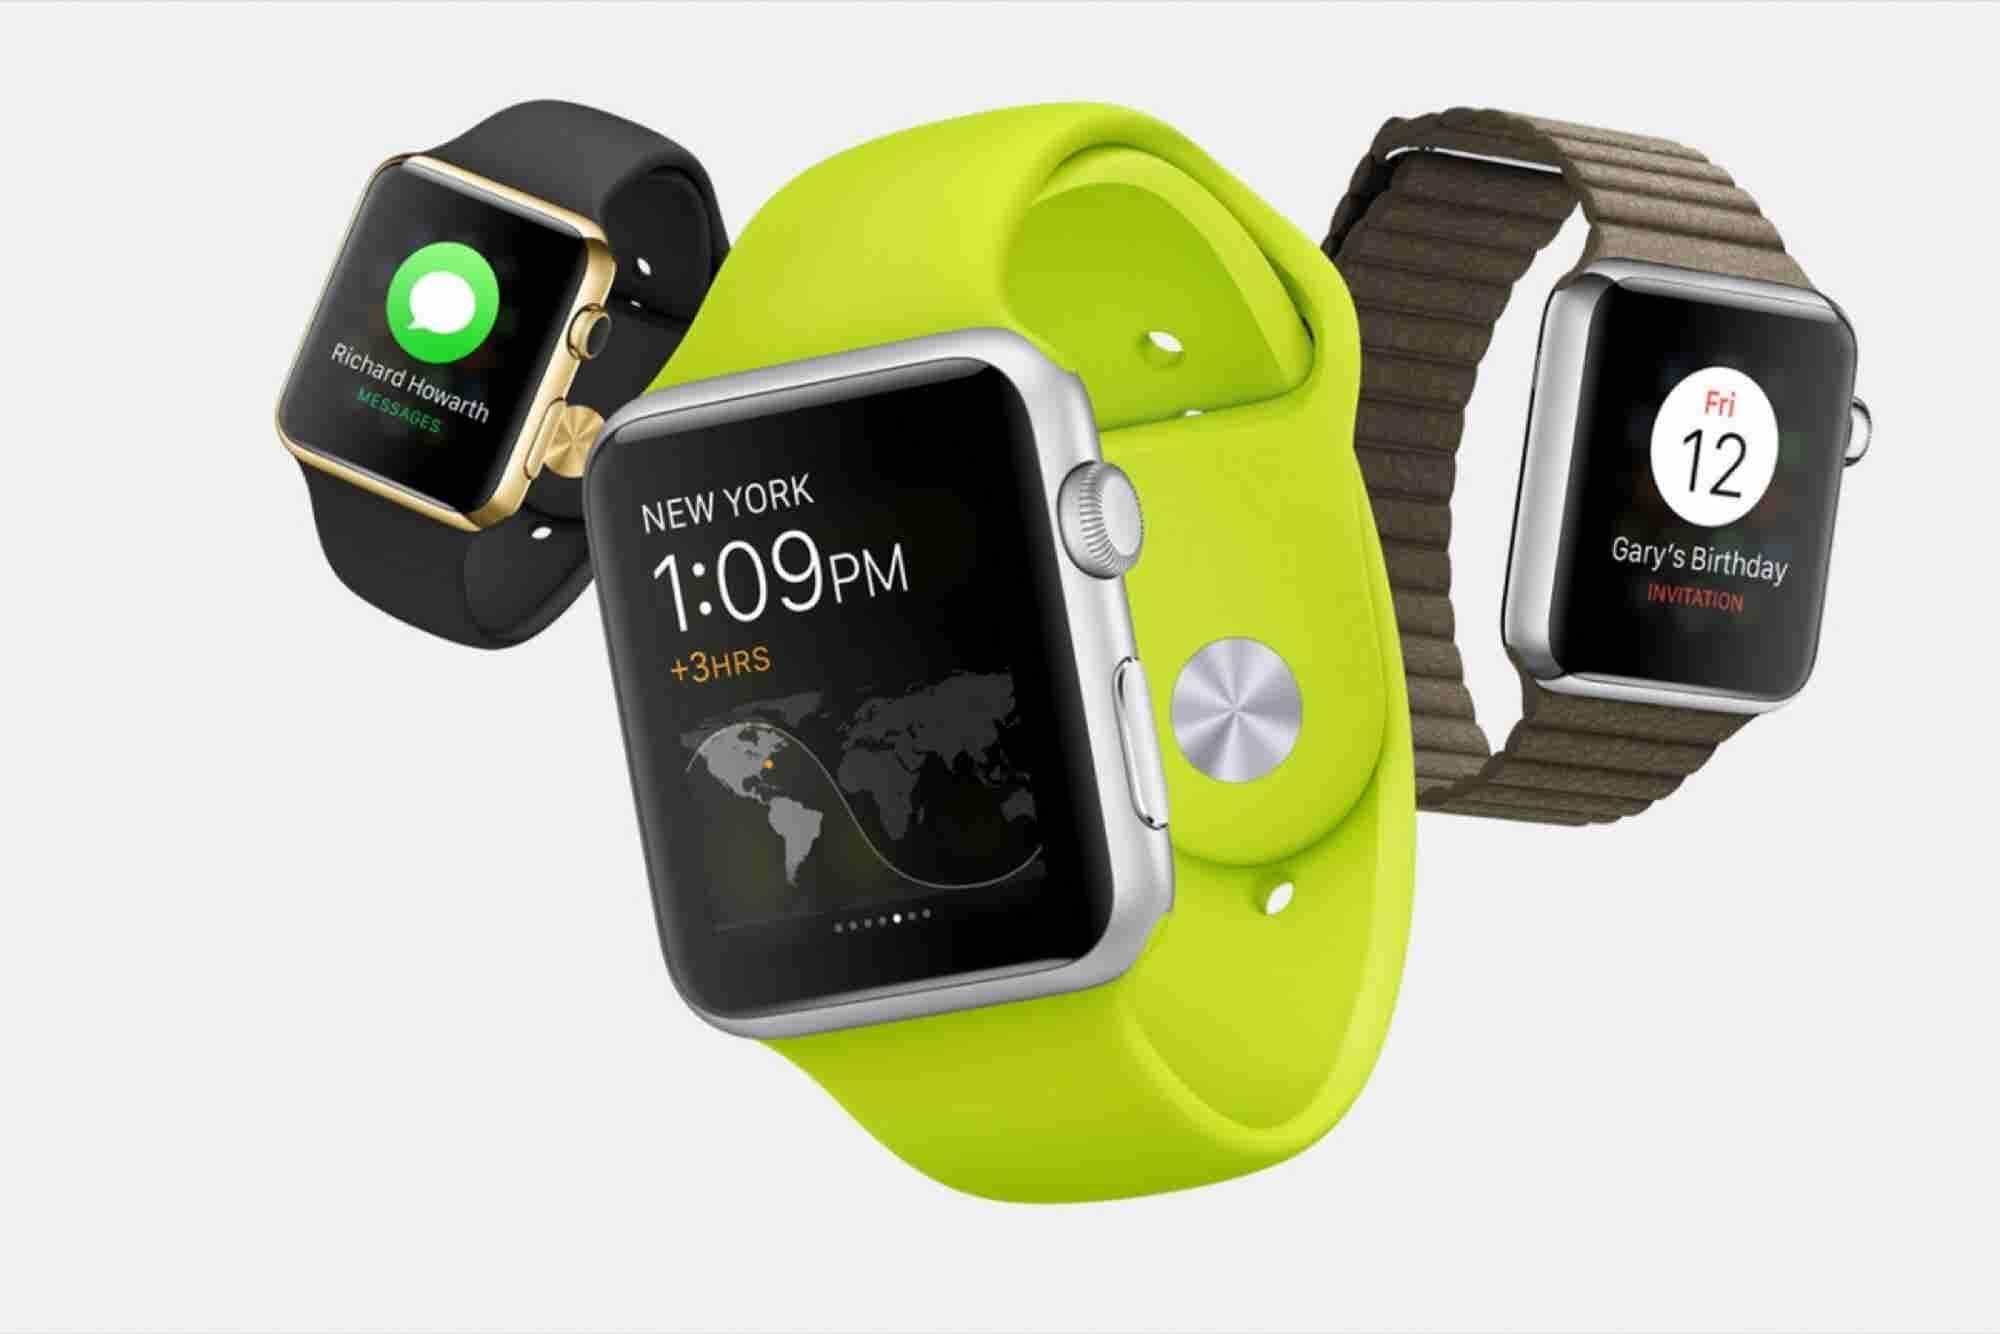 Is Apple Watch a Design Flop?